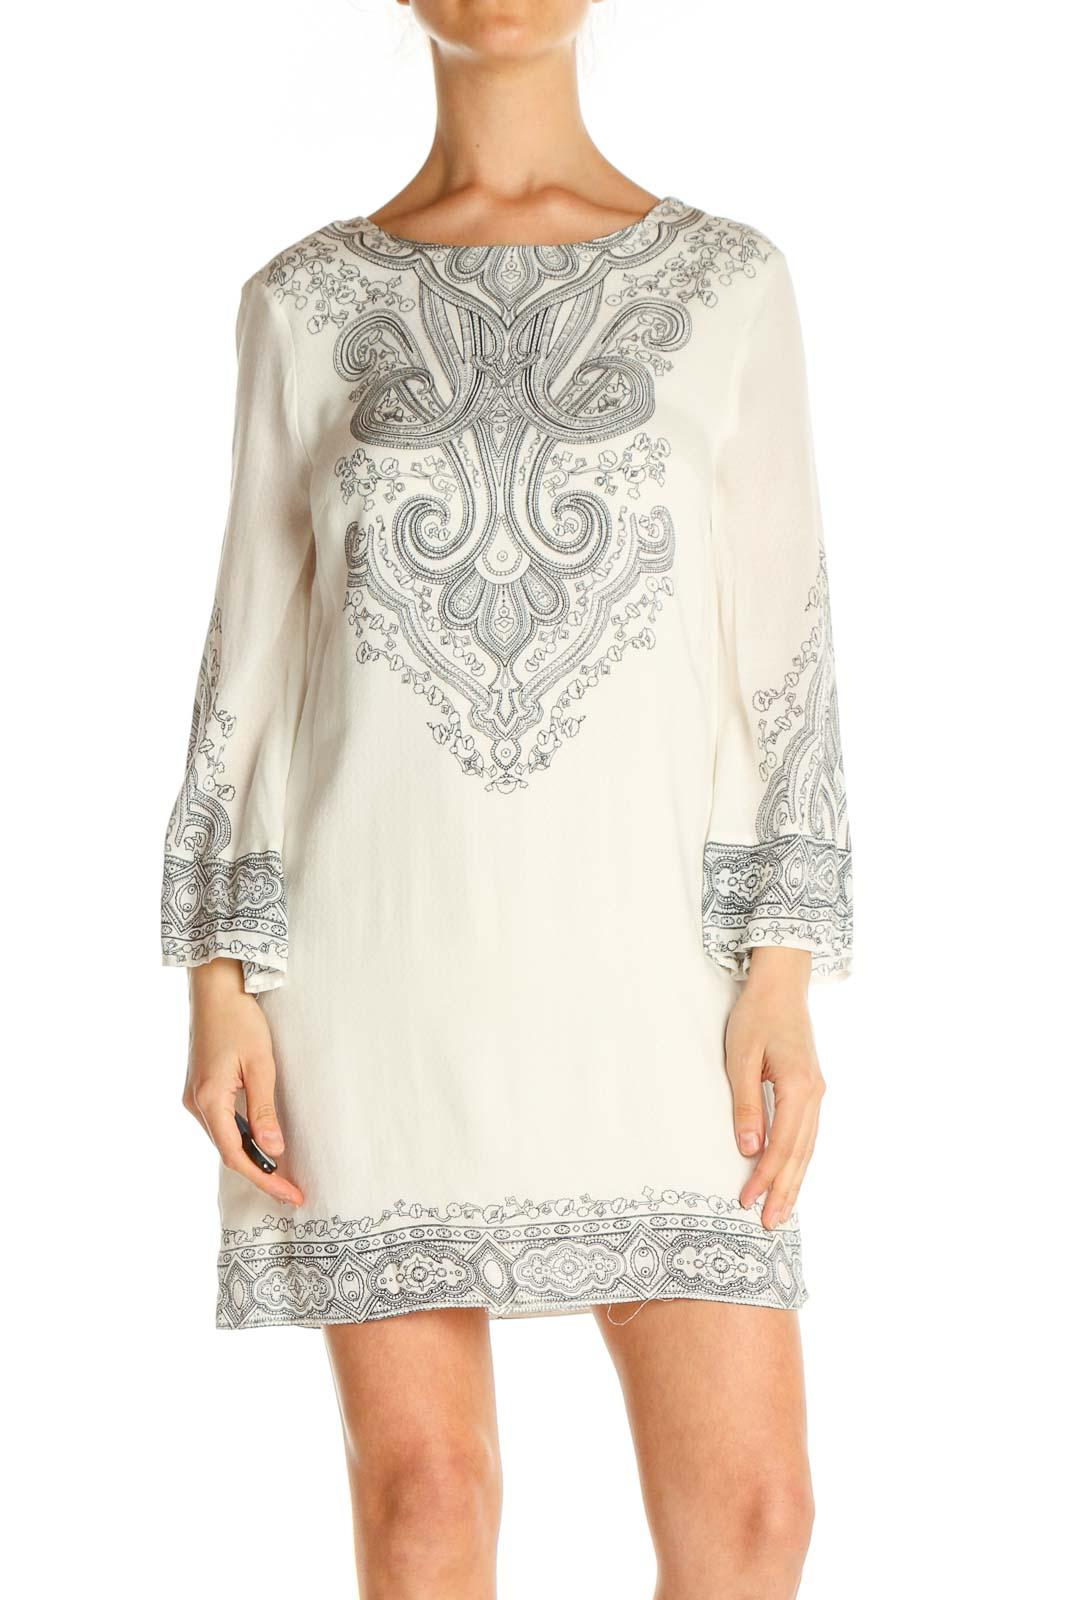 Beige Lace Day Sheath Dress Front